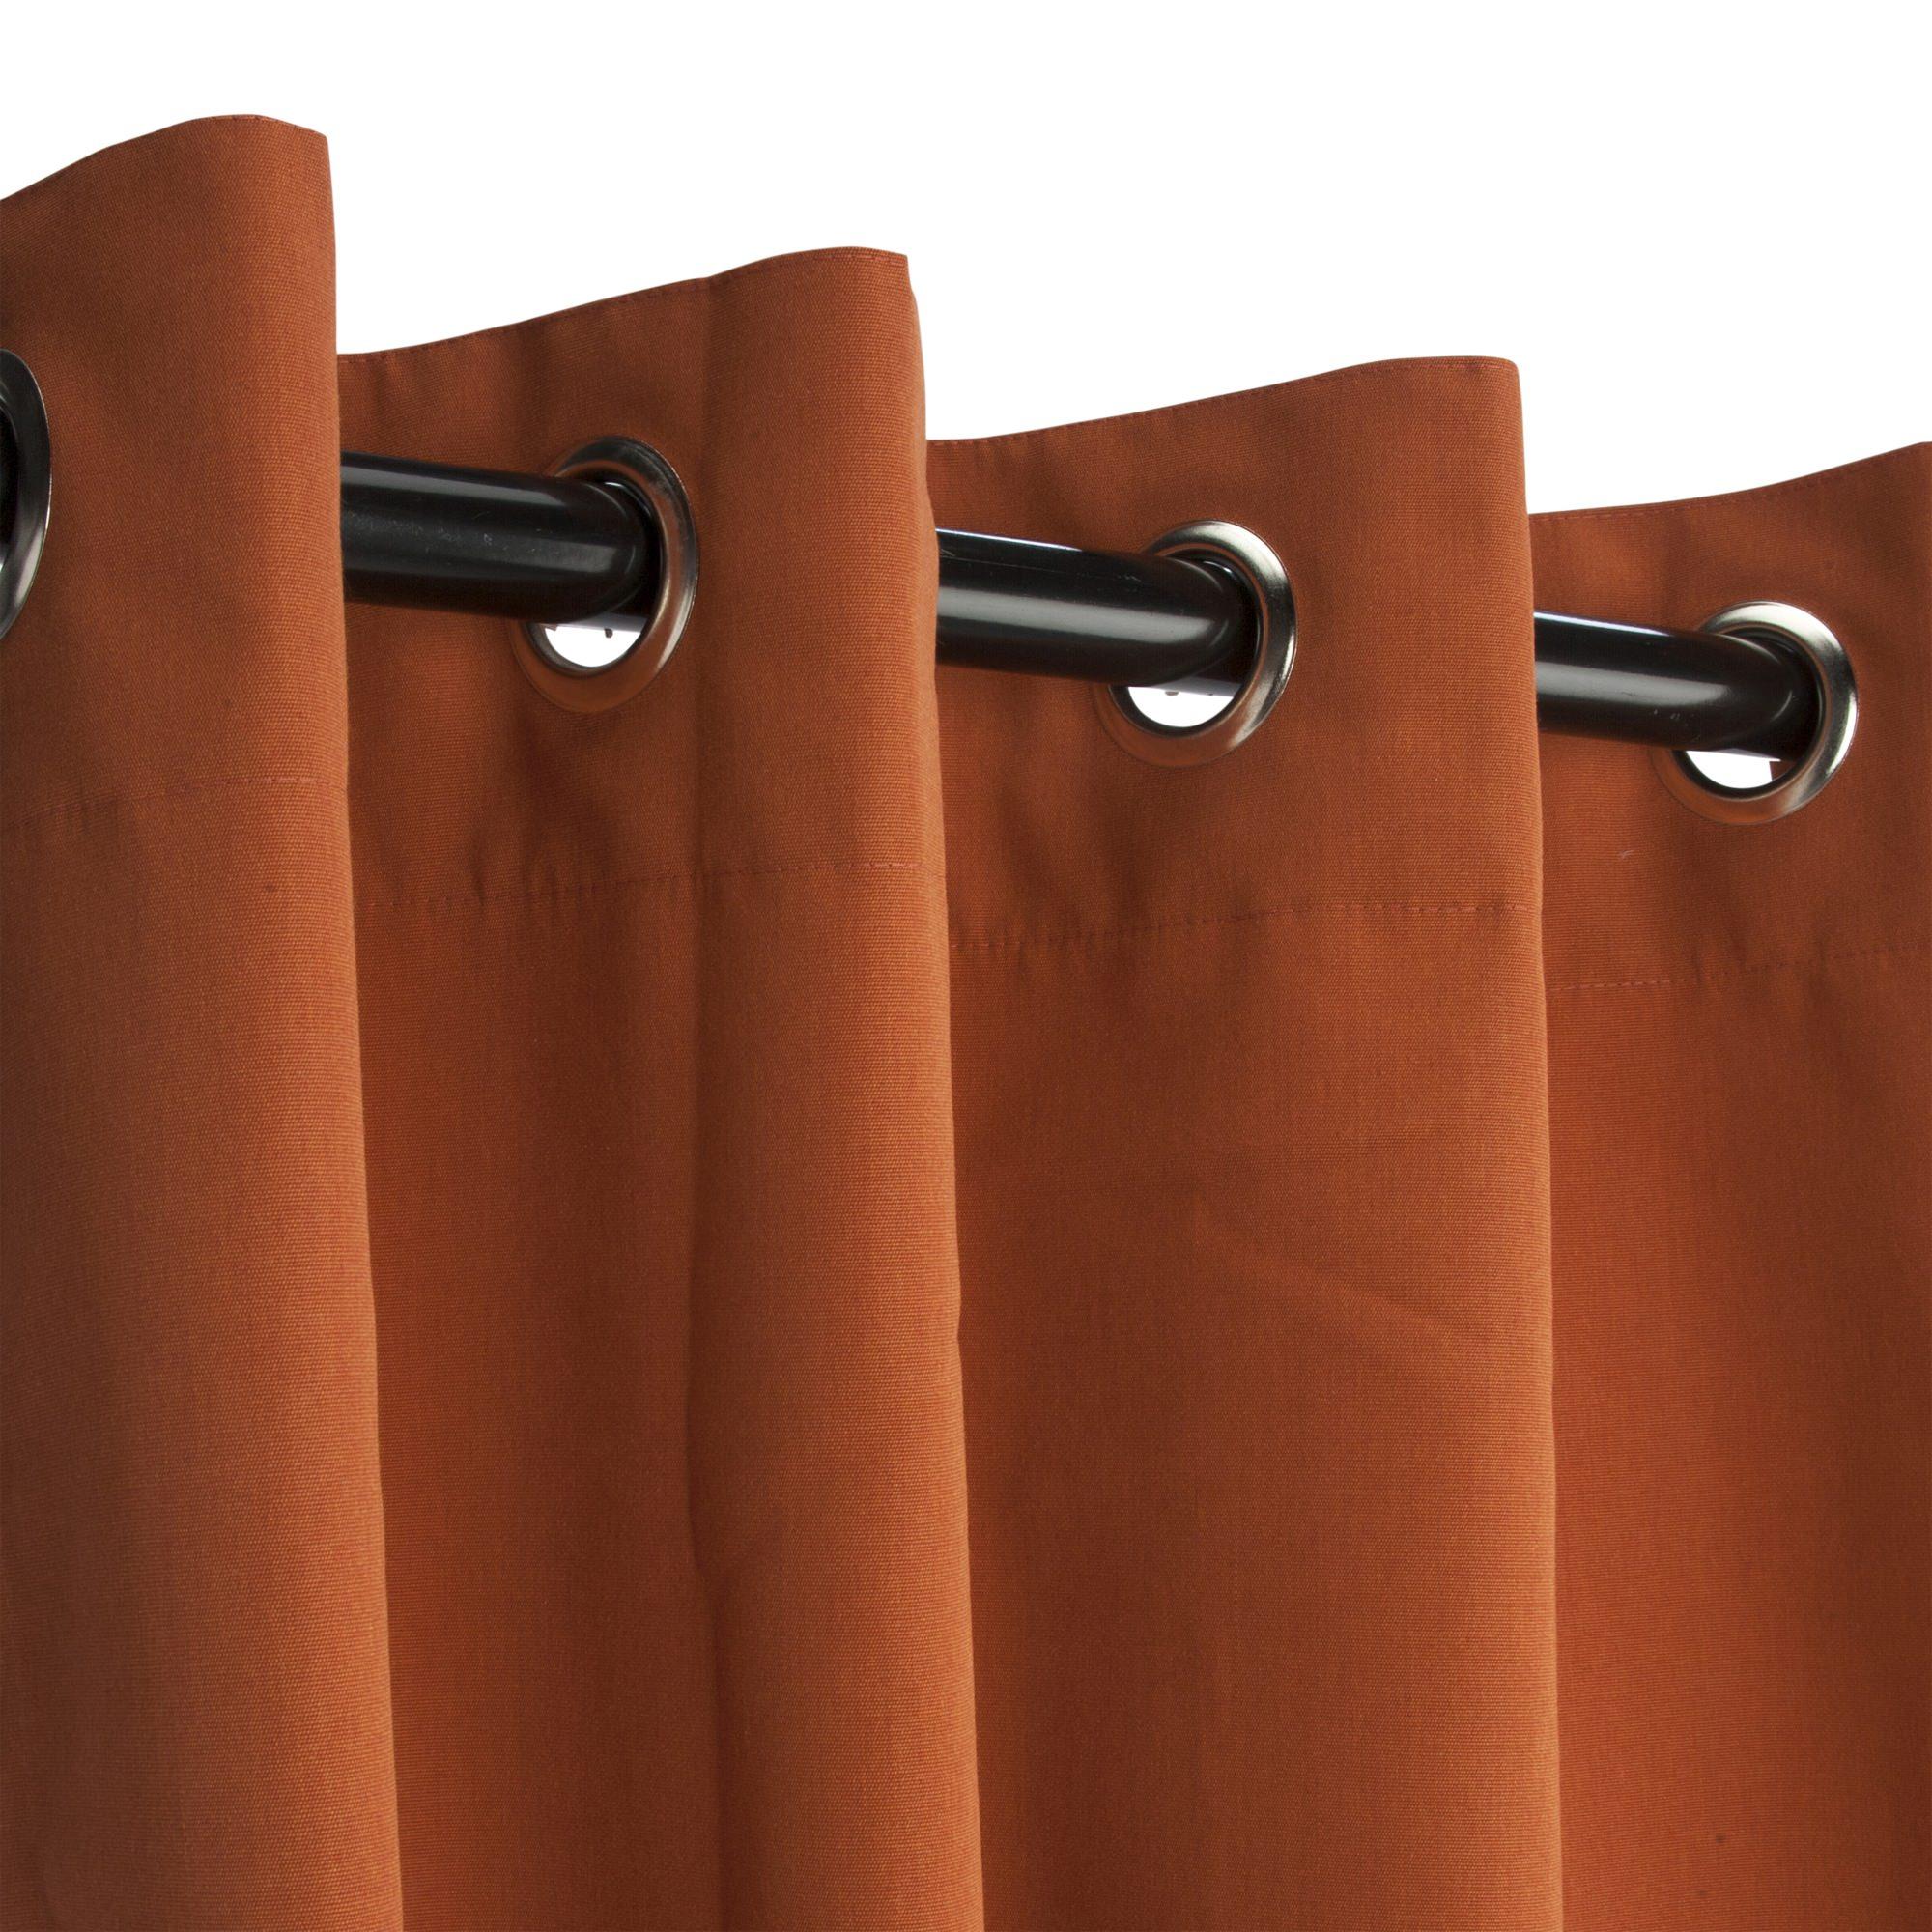 Rust Grommeted Sunbrella Outdoor Curtains